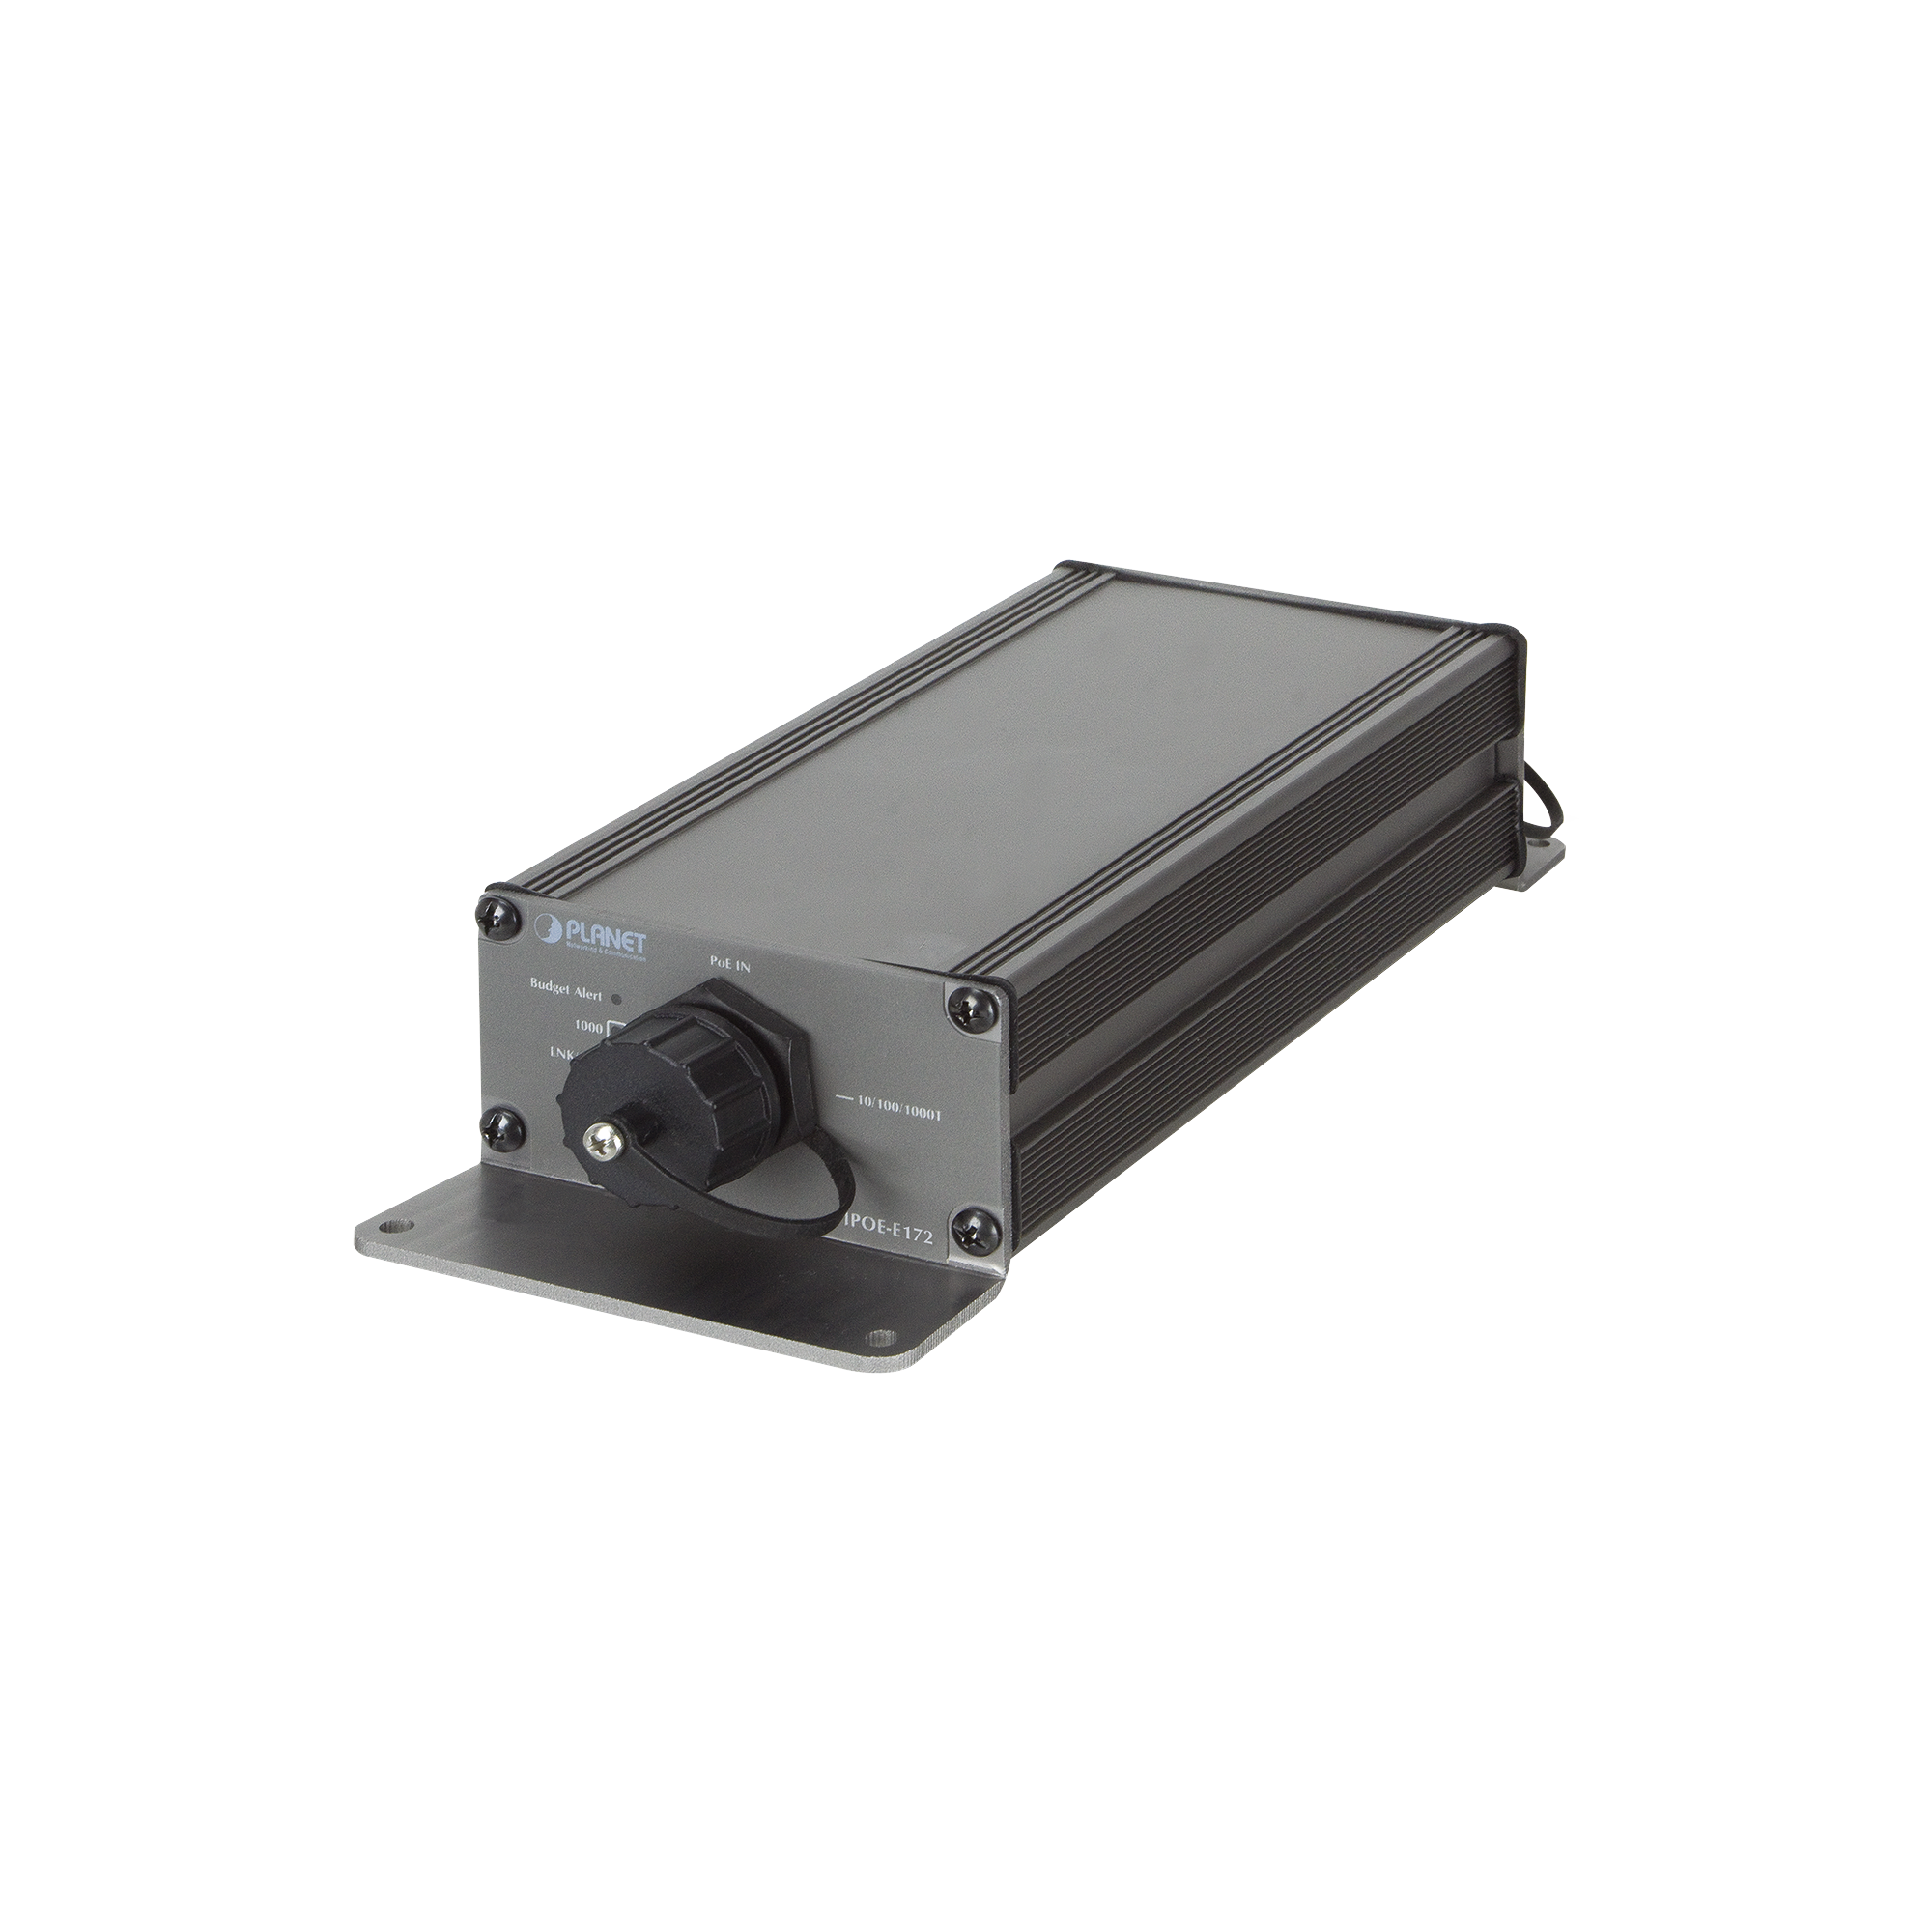 Extensor Industrial para exterior Ultra PoE 802.3bt/at Gigabit